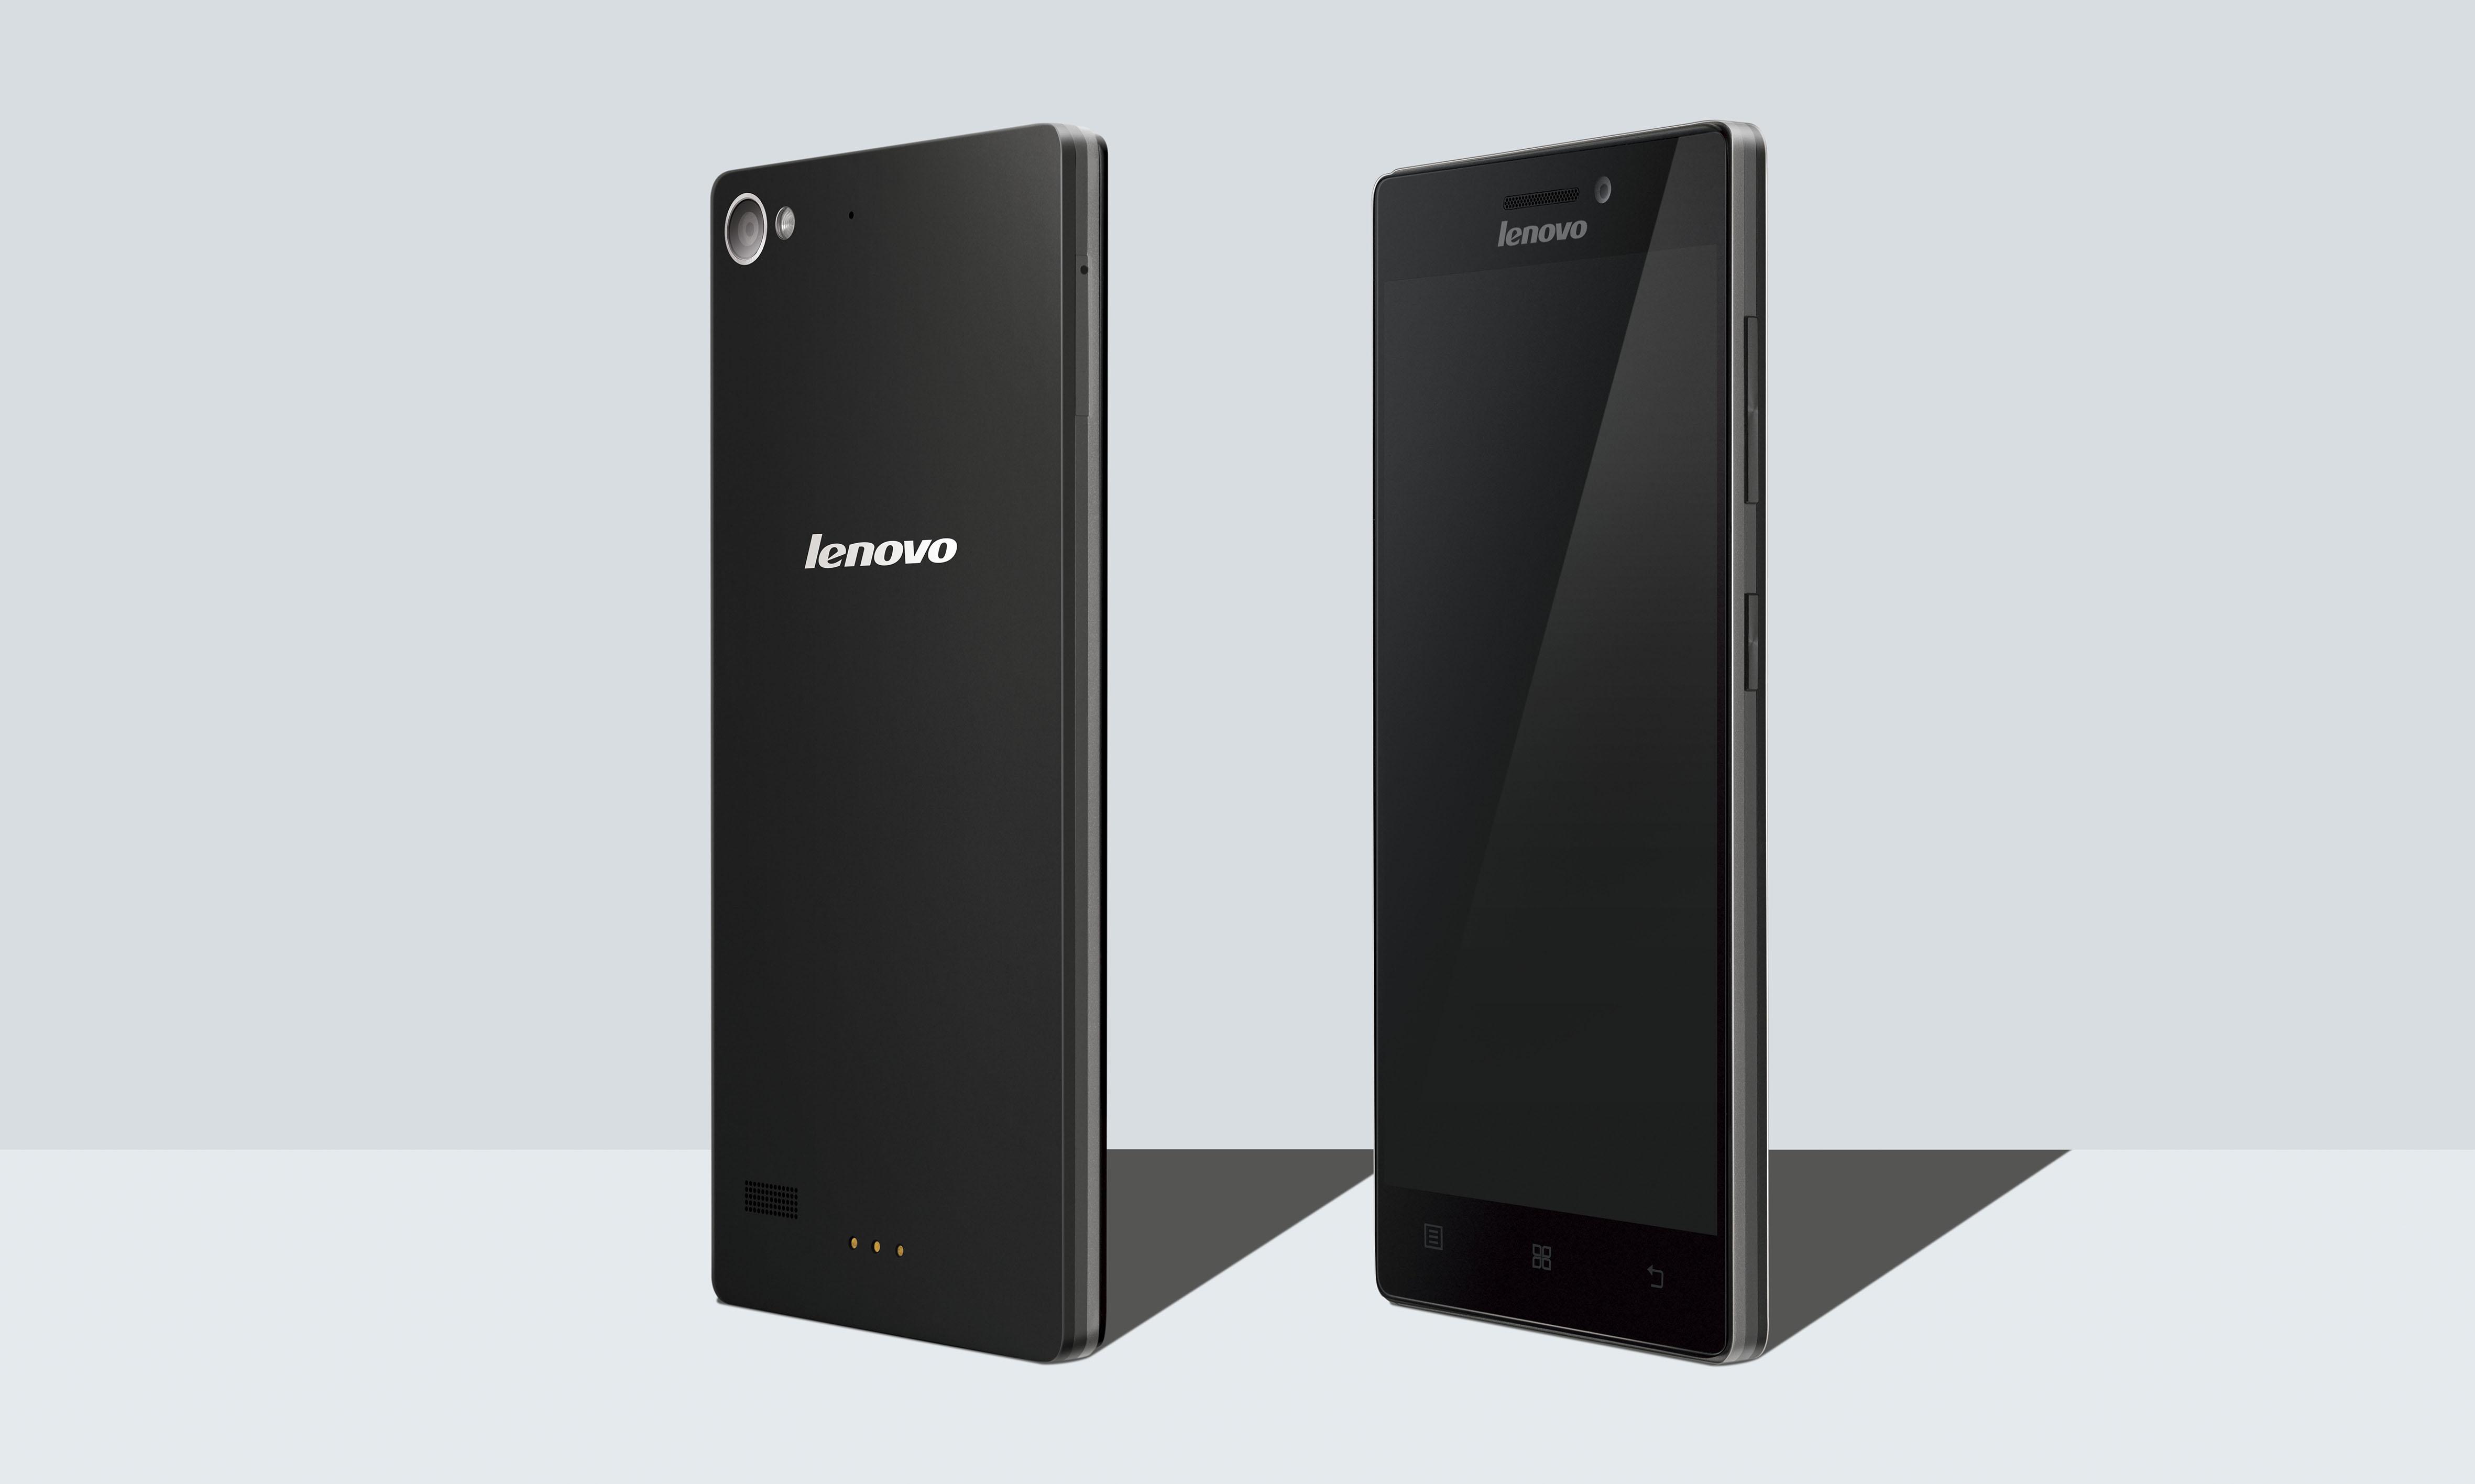 Lenovo présente les Vibe X2 et Vibe Z2